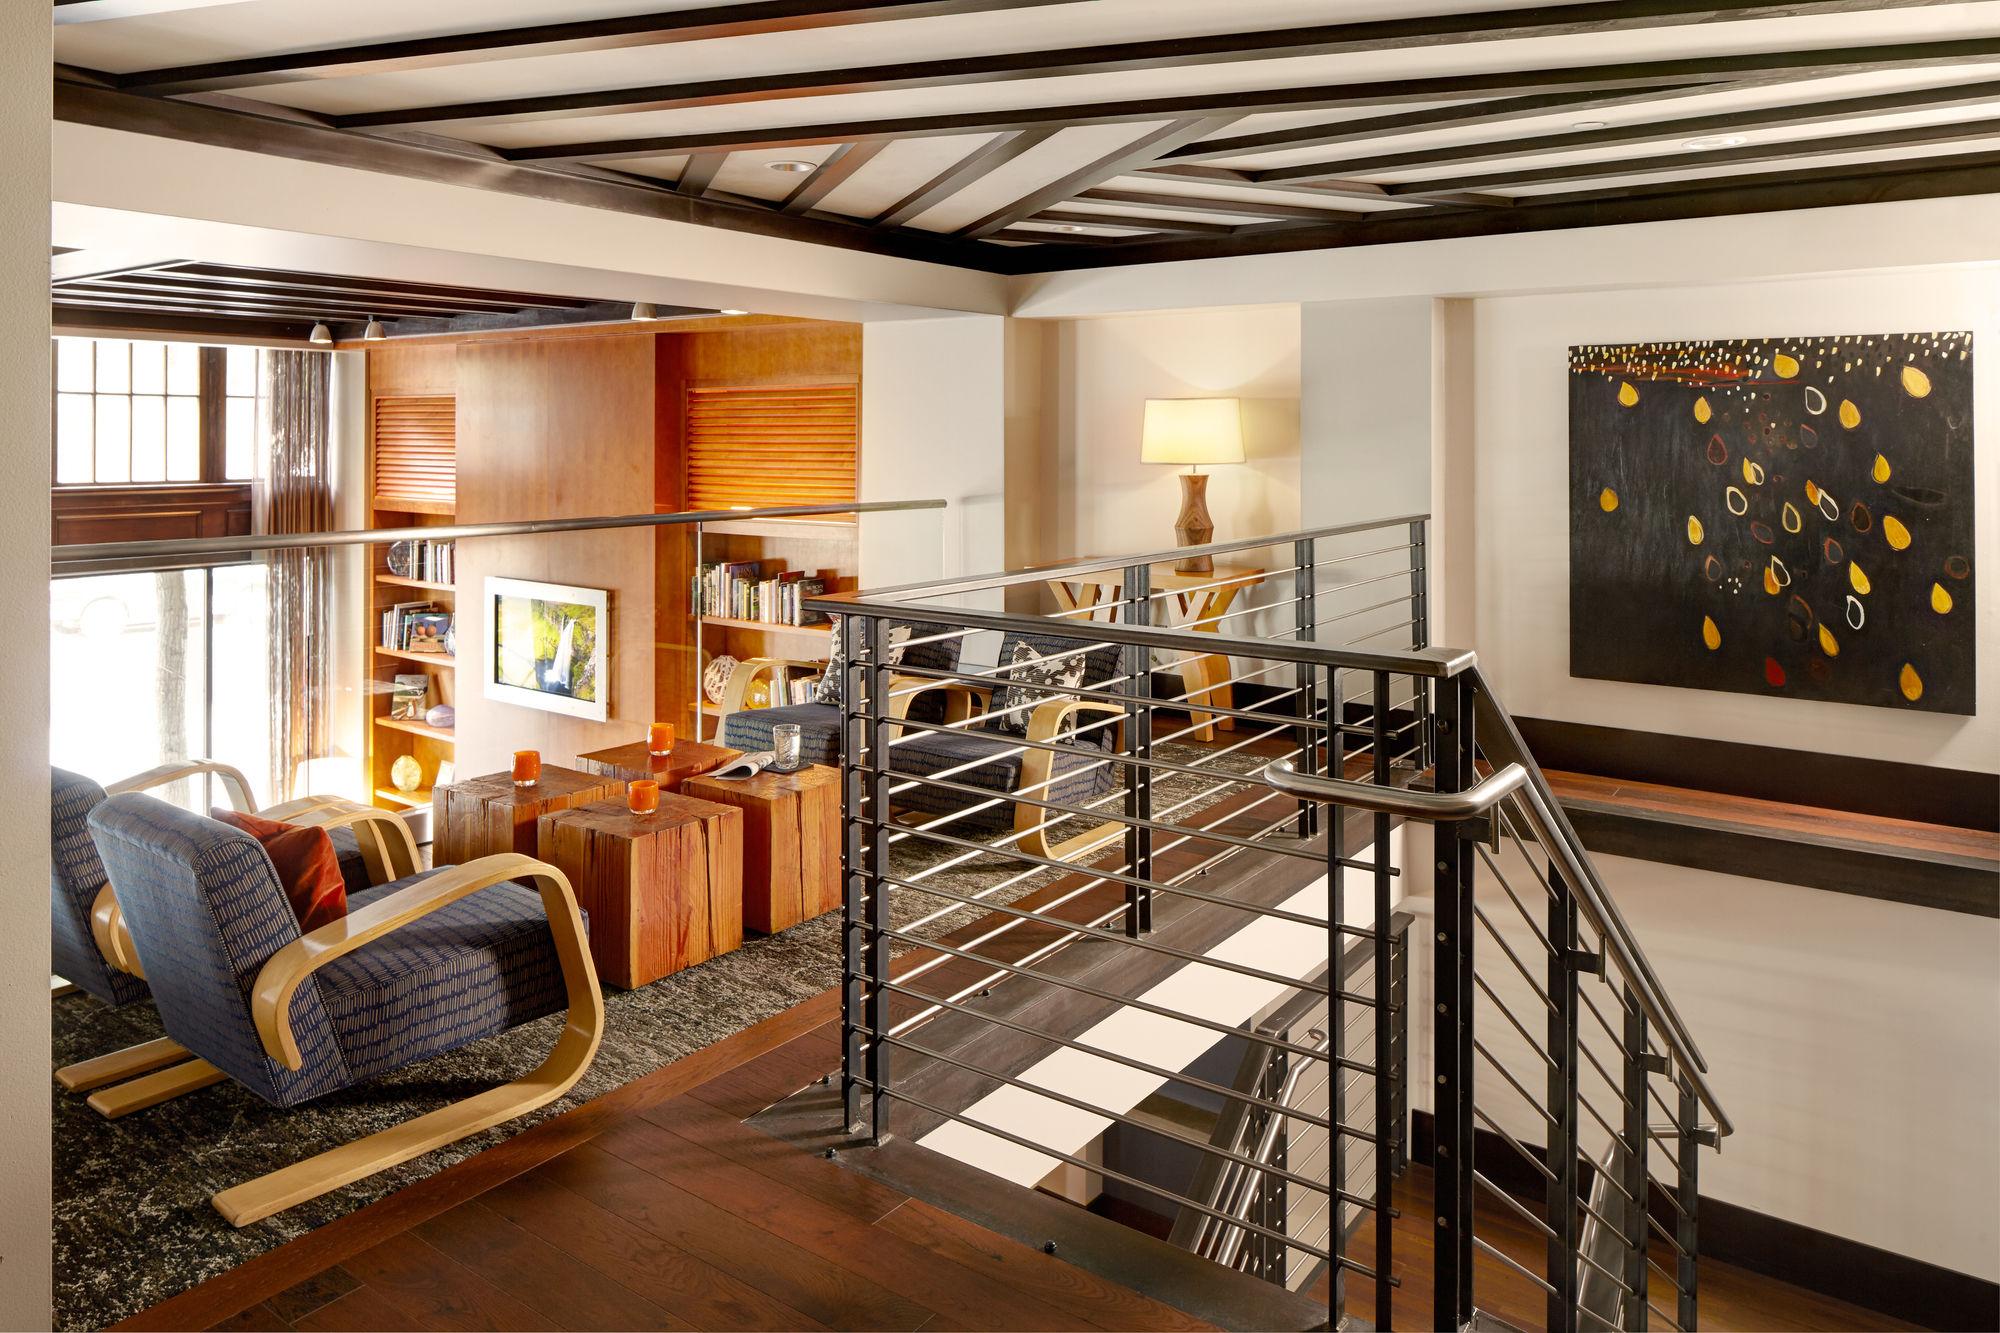 Hotel Andra, Seattle, WA : Five Star Alliance